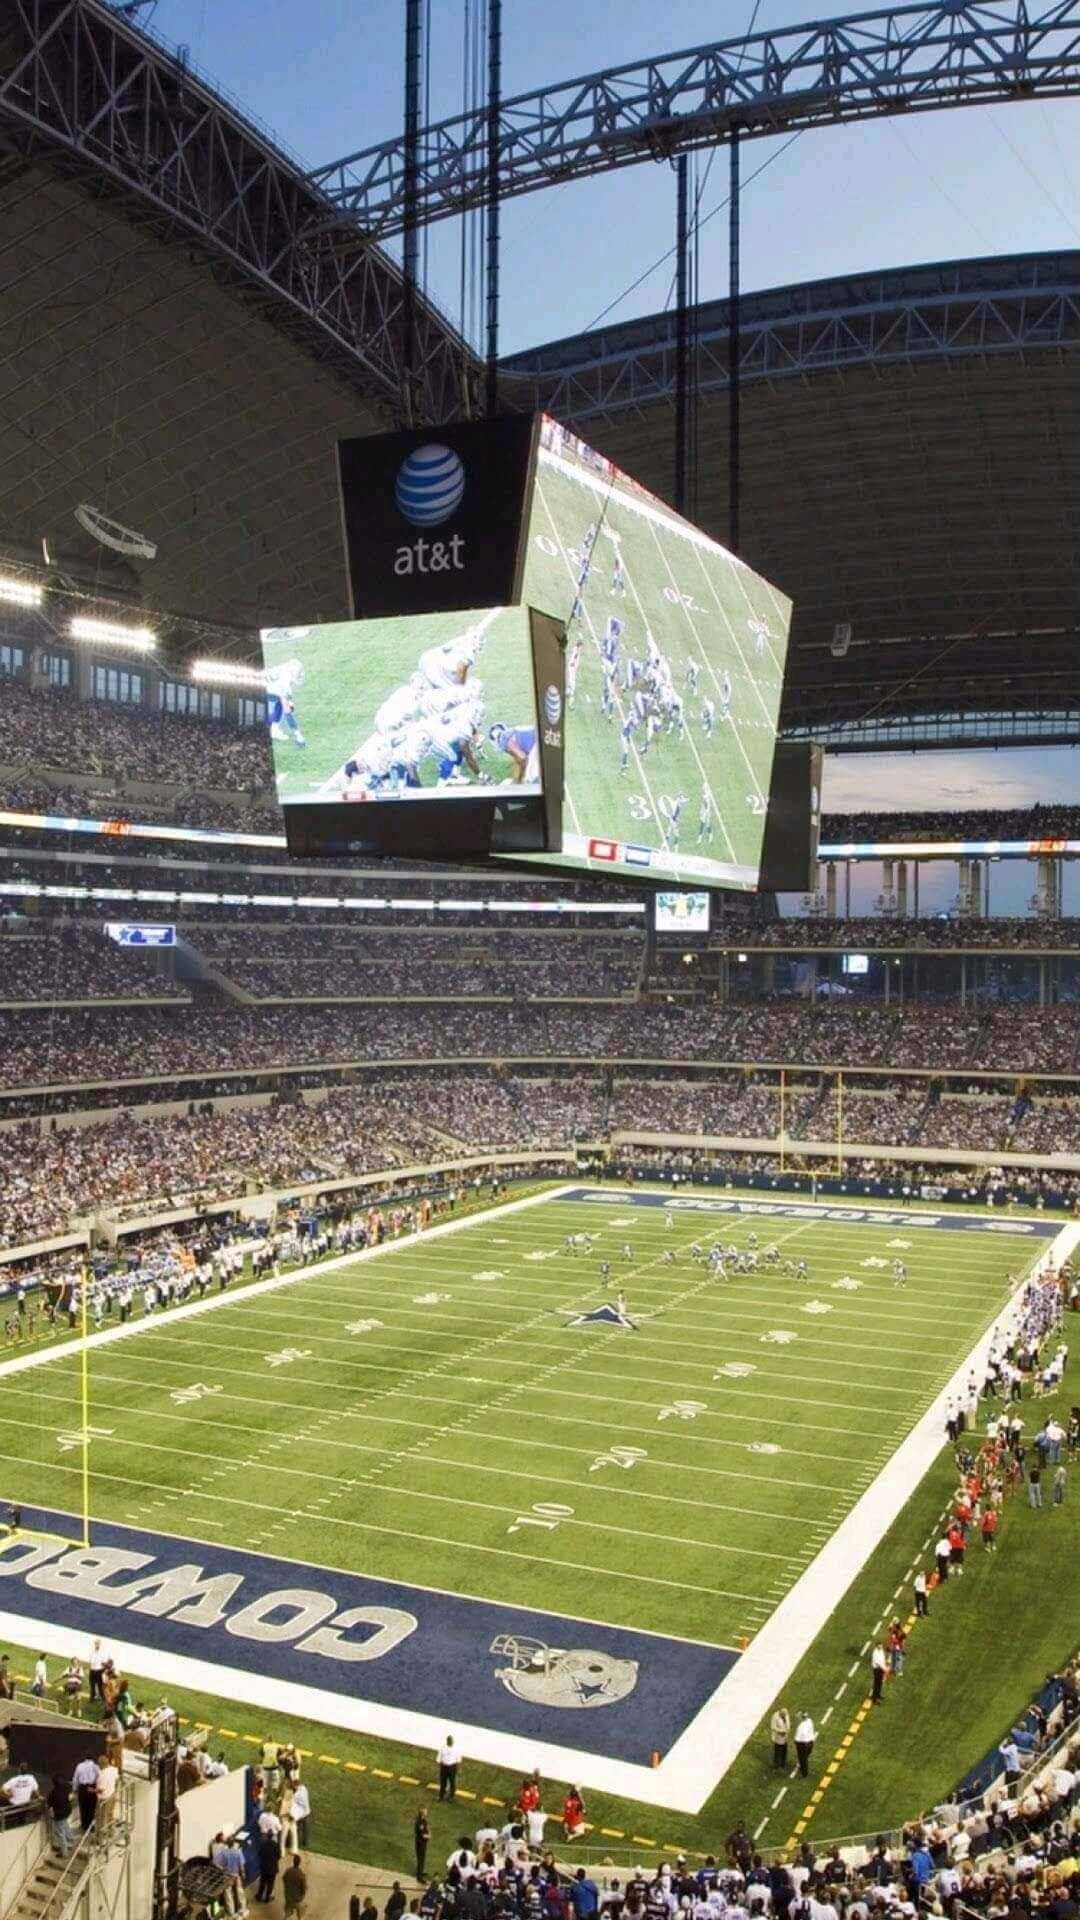 Pin by Jessica Alexander on Cowboys Cowboys stadium